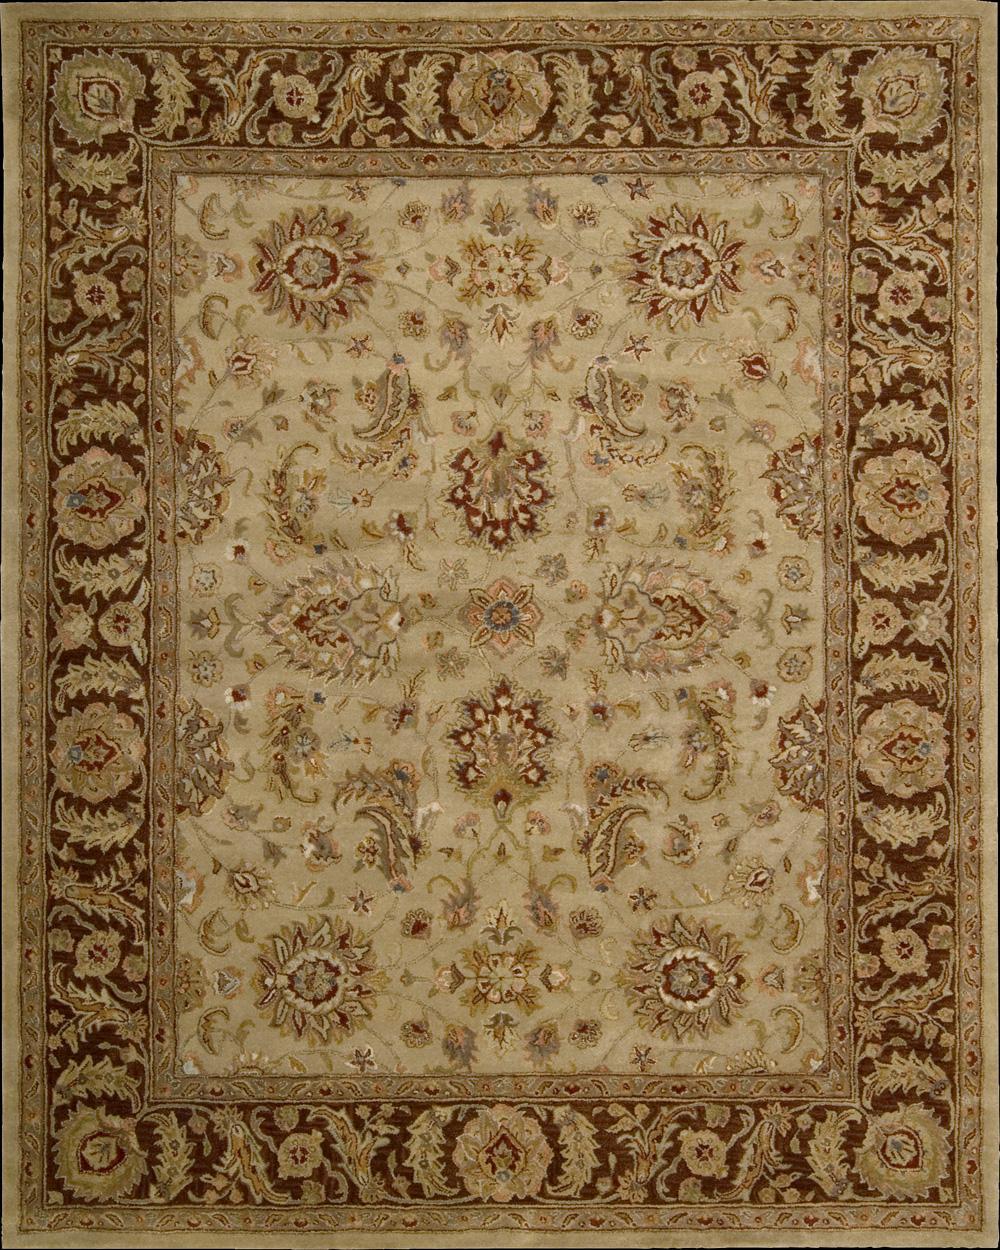 "Nourison Jaipur Area Rug 9'6"" x 13'6"" - Item Number: 85749"